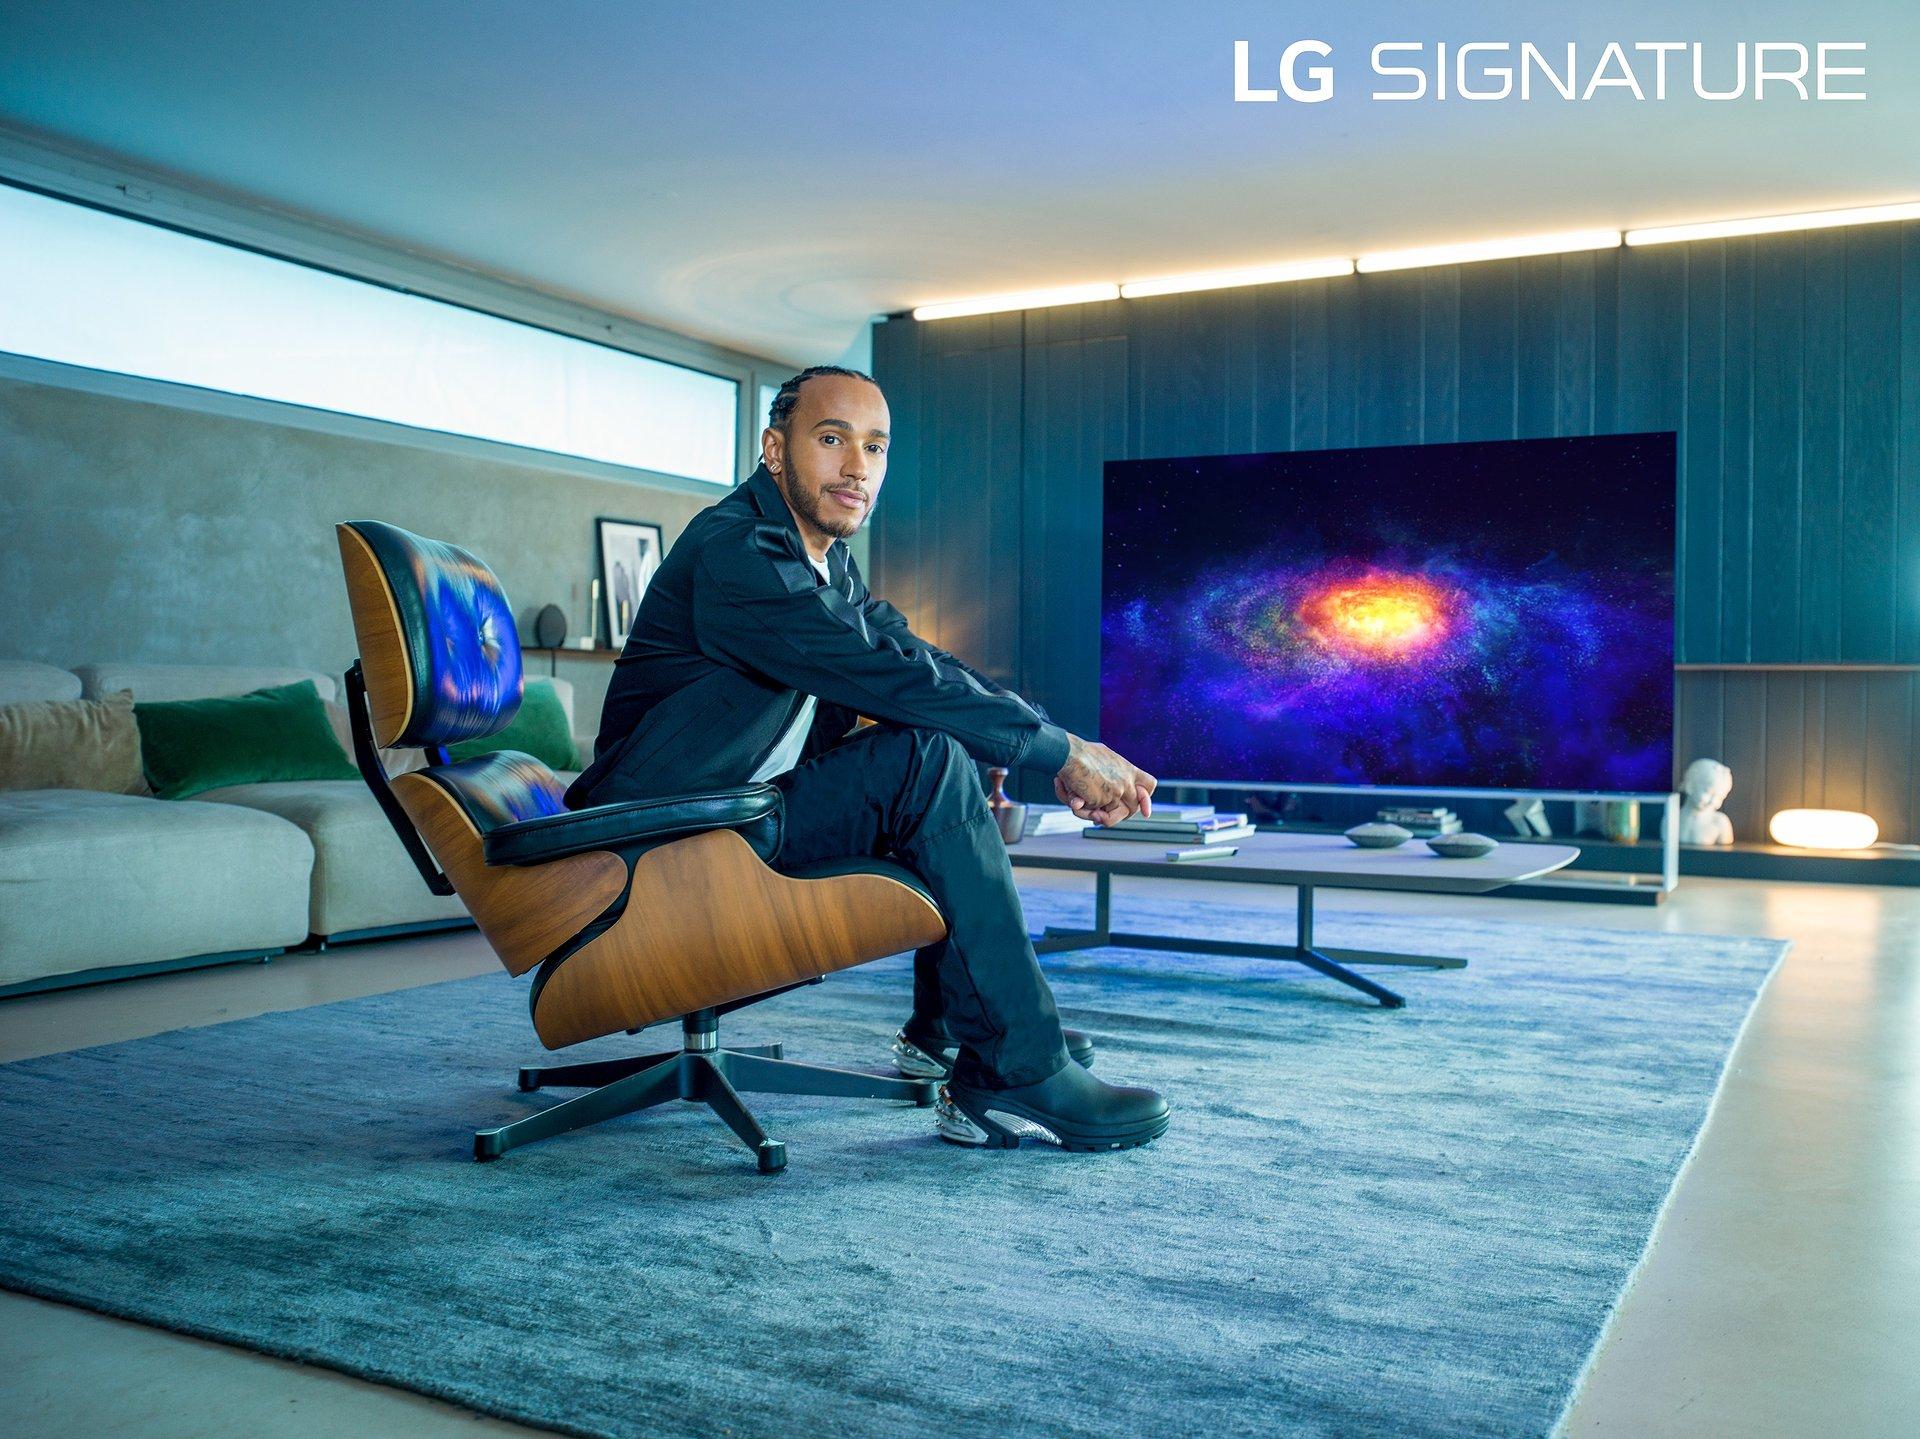 Sześciokrotny mistrz świata Formuły 1 – Lewis Hamilton – Ambasadorem marki LG SIGNATURE